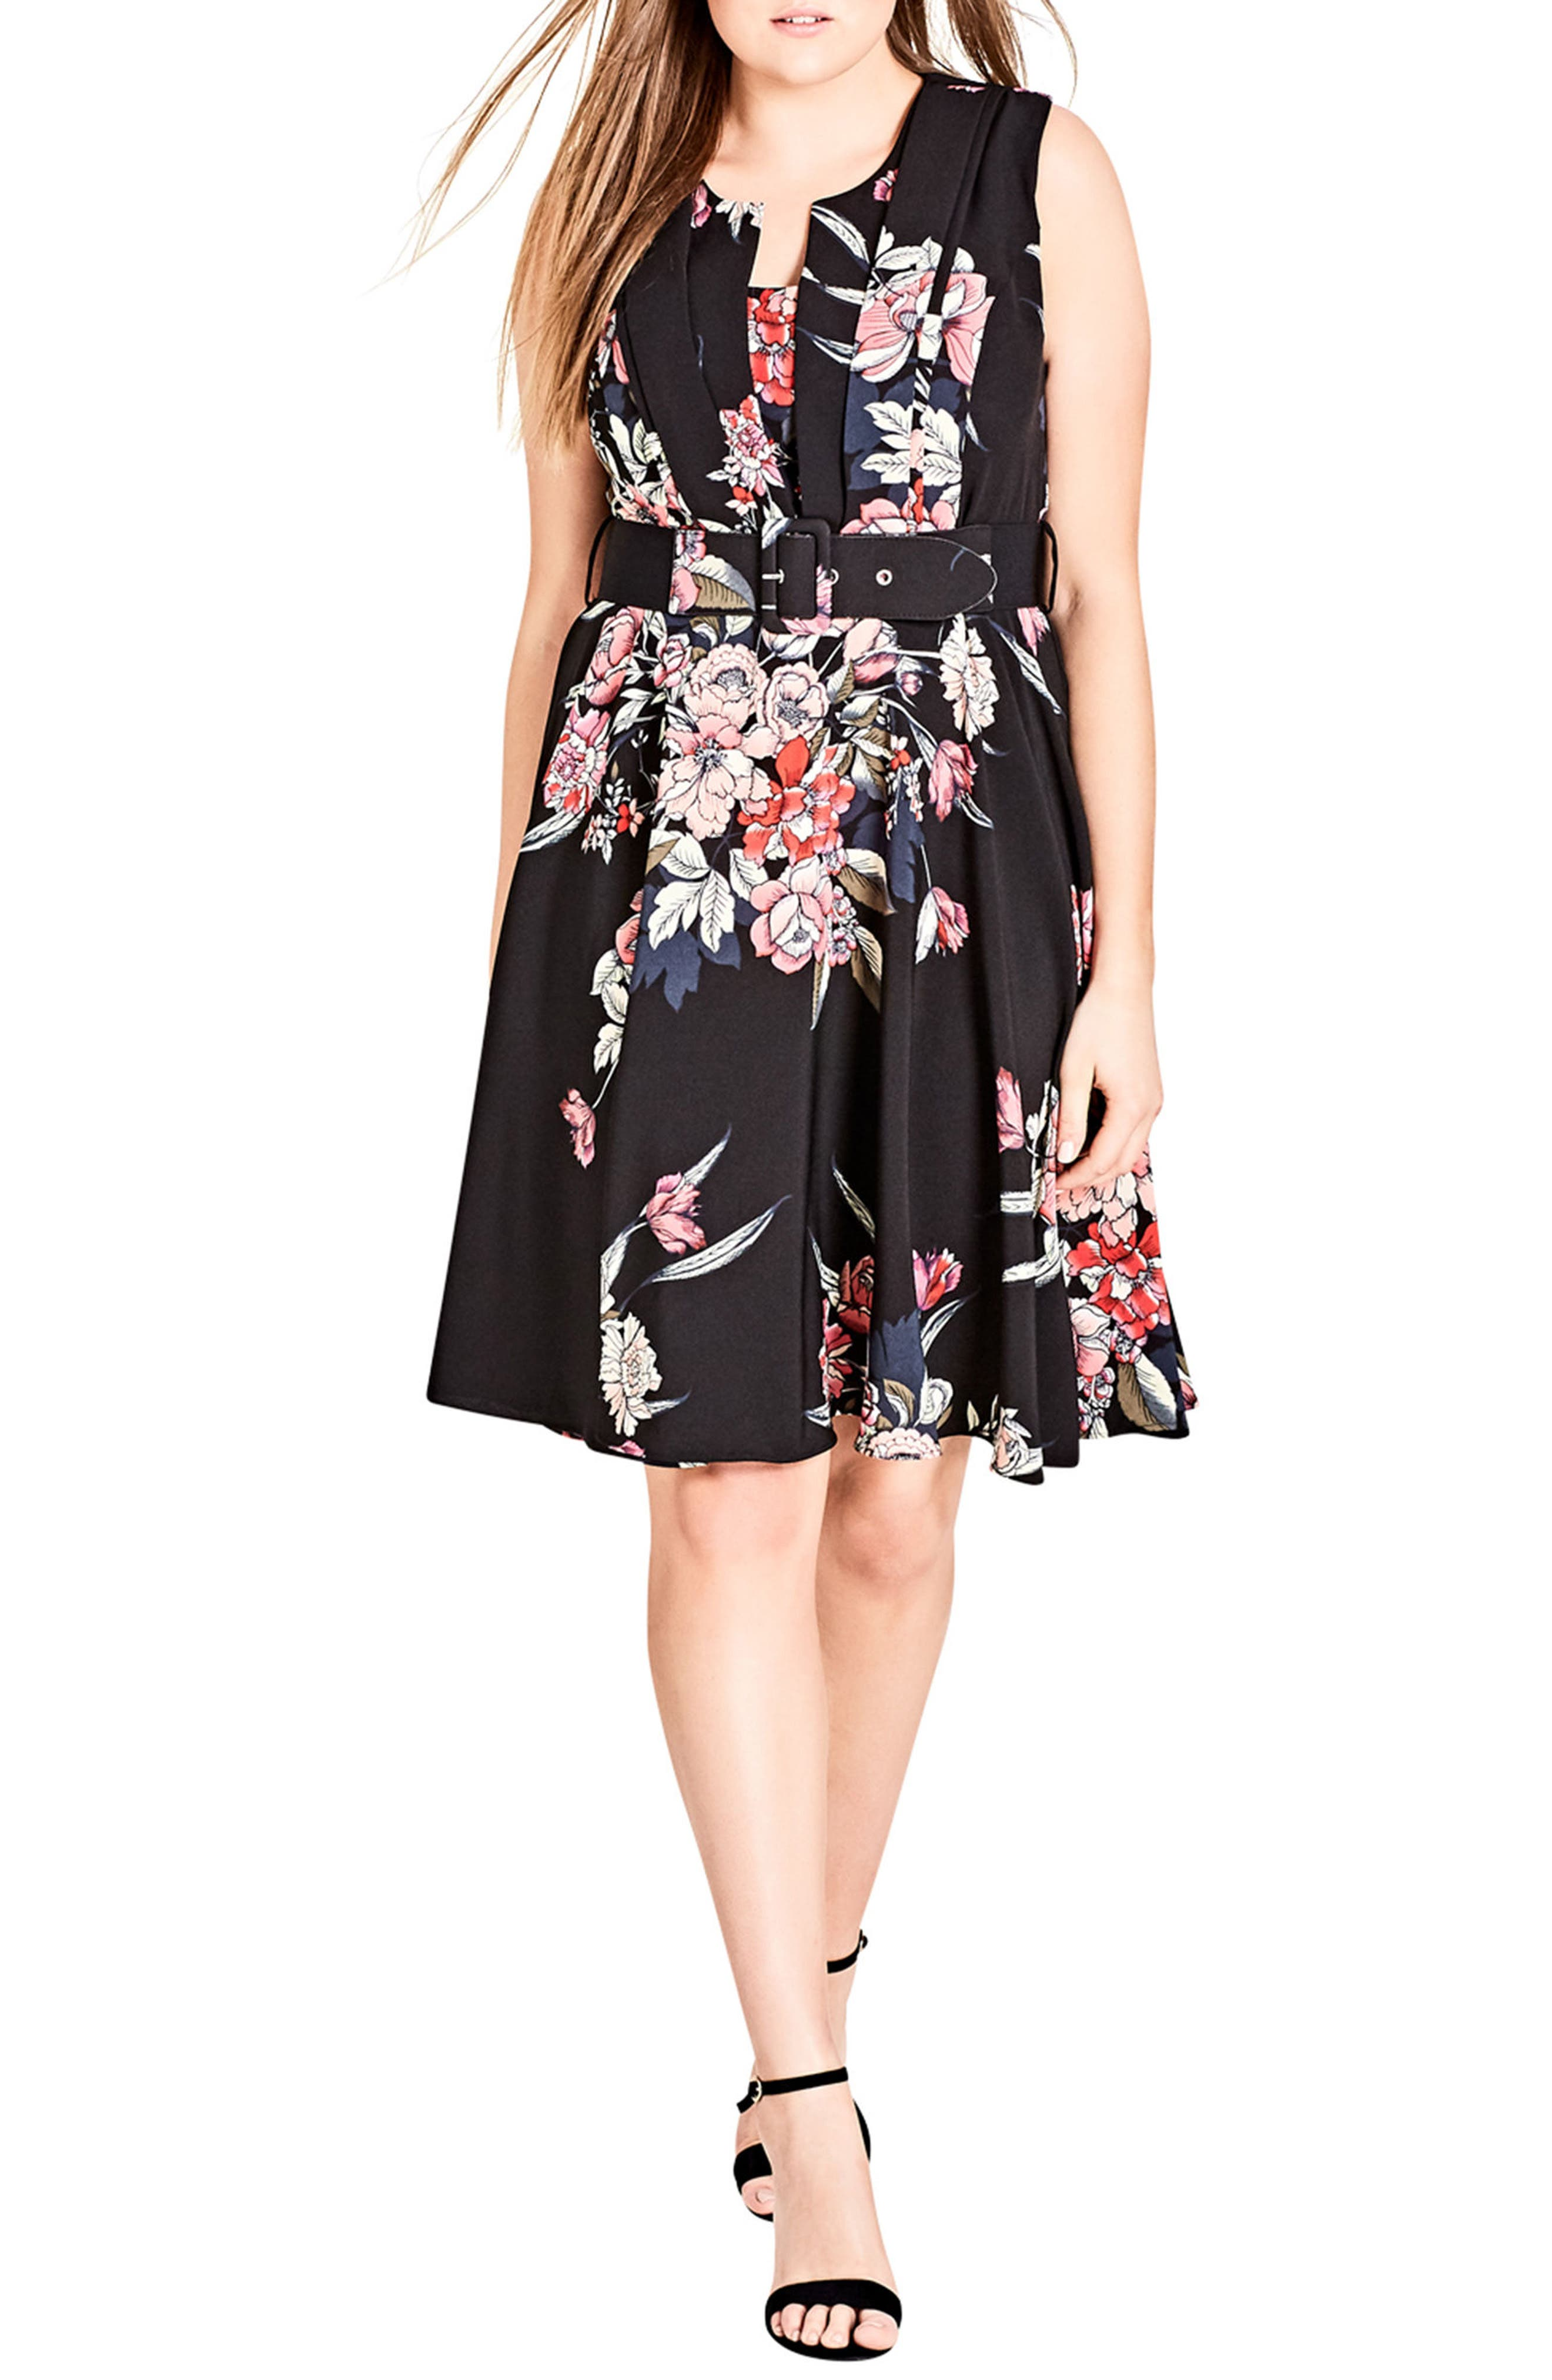 Plus Size City Chic Misty Floral Fit & Flare Dress, Black